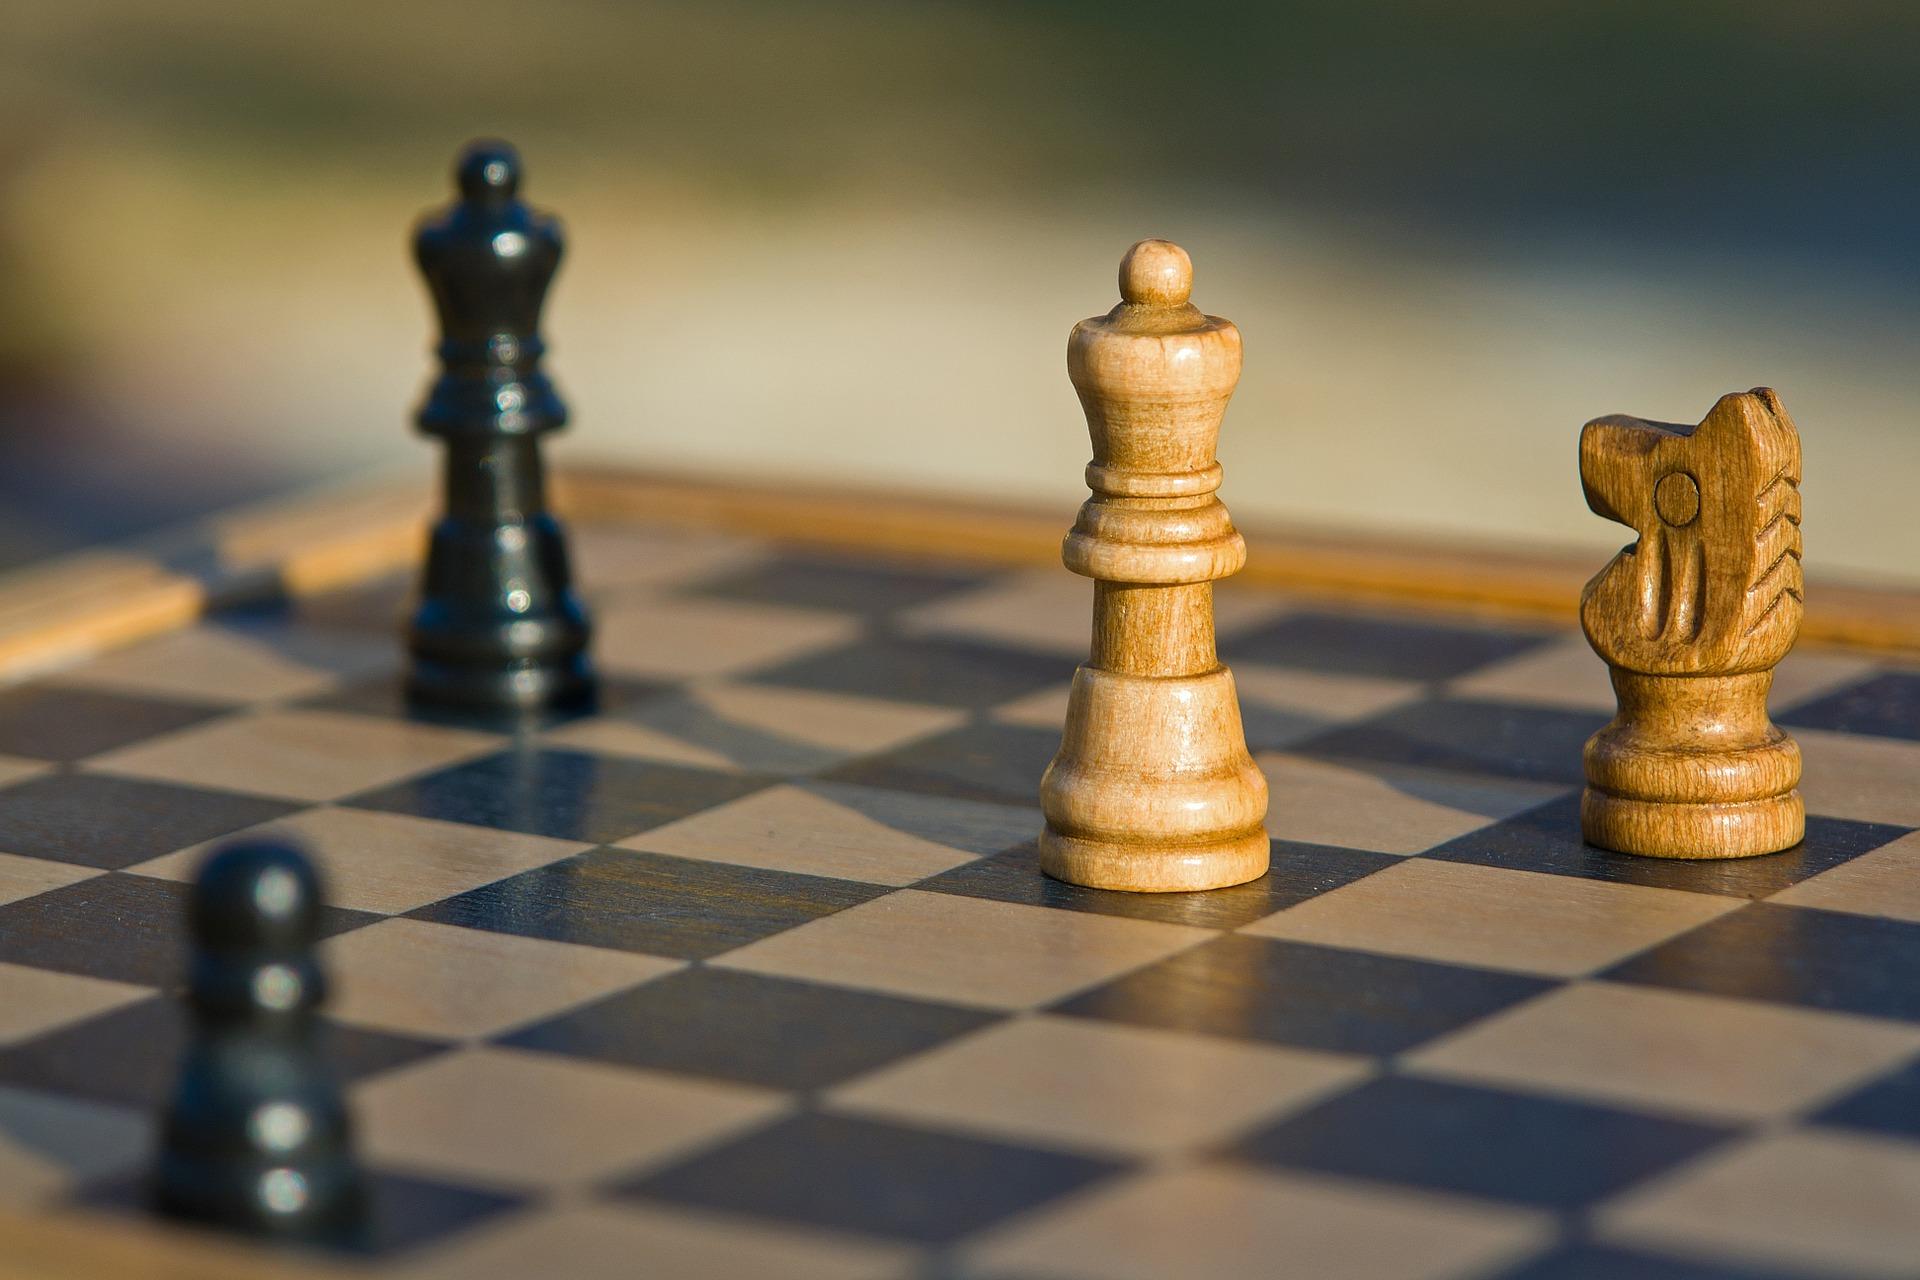 ajedrez, tablero, fichas, estrategia, juegos de mesa - Fondos de Pantalla HD - professor-falken.com